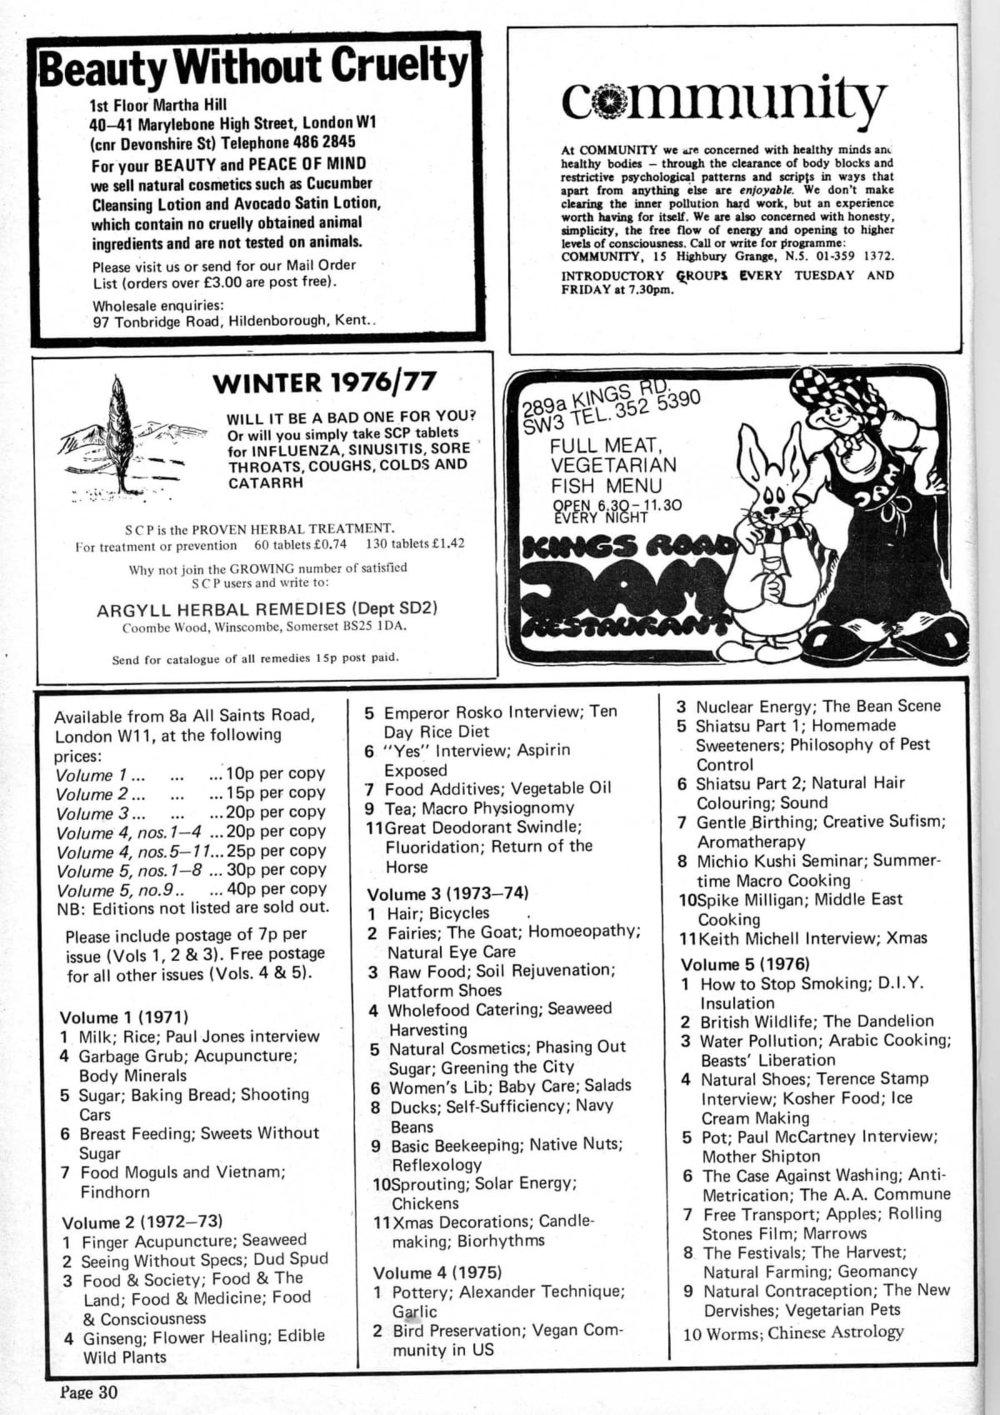 seed-v6-n1-jan1977-32.jpg